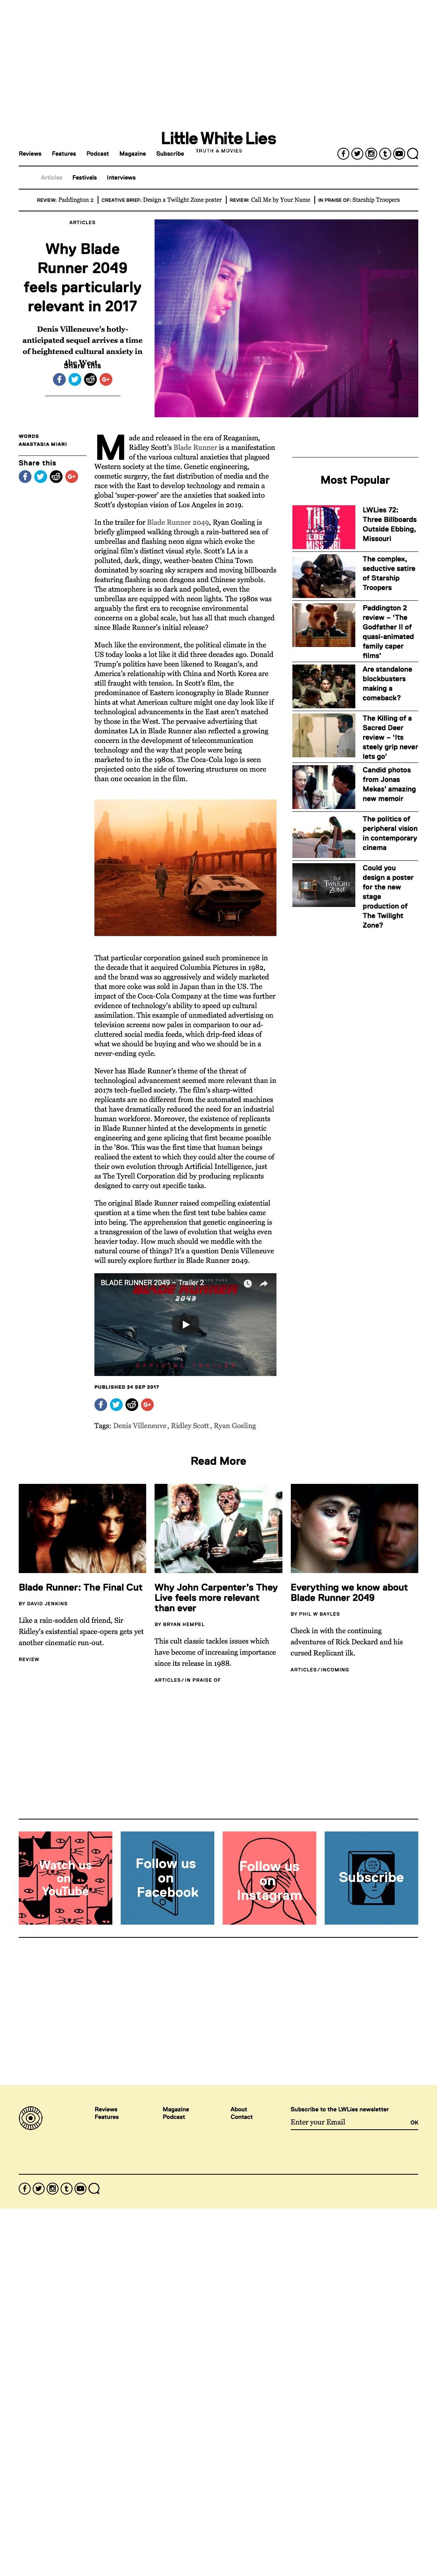 Blade Runner Little White Lies.jpg